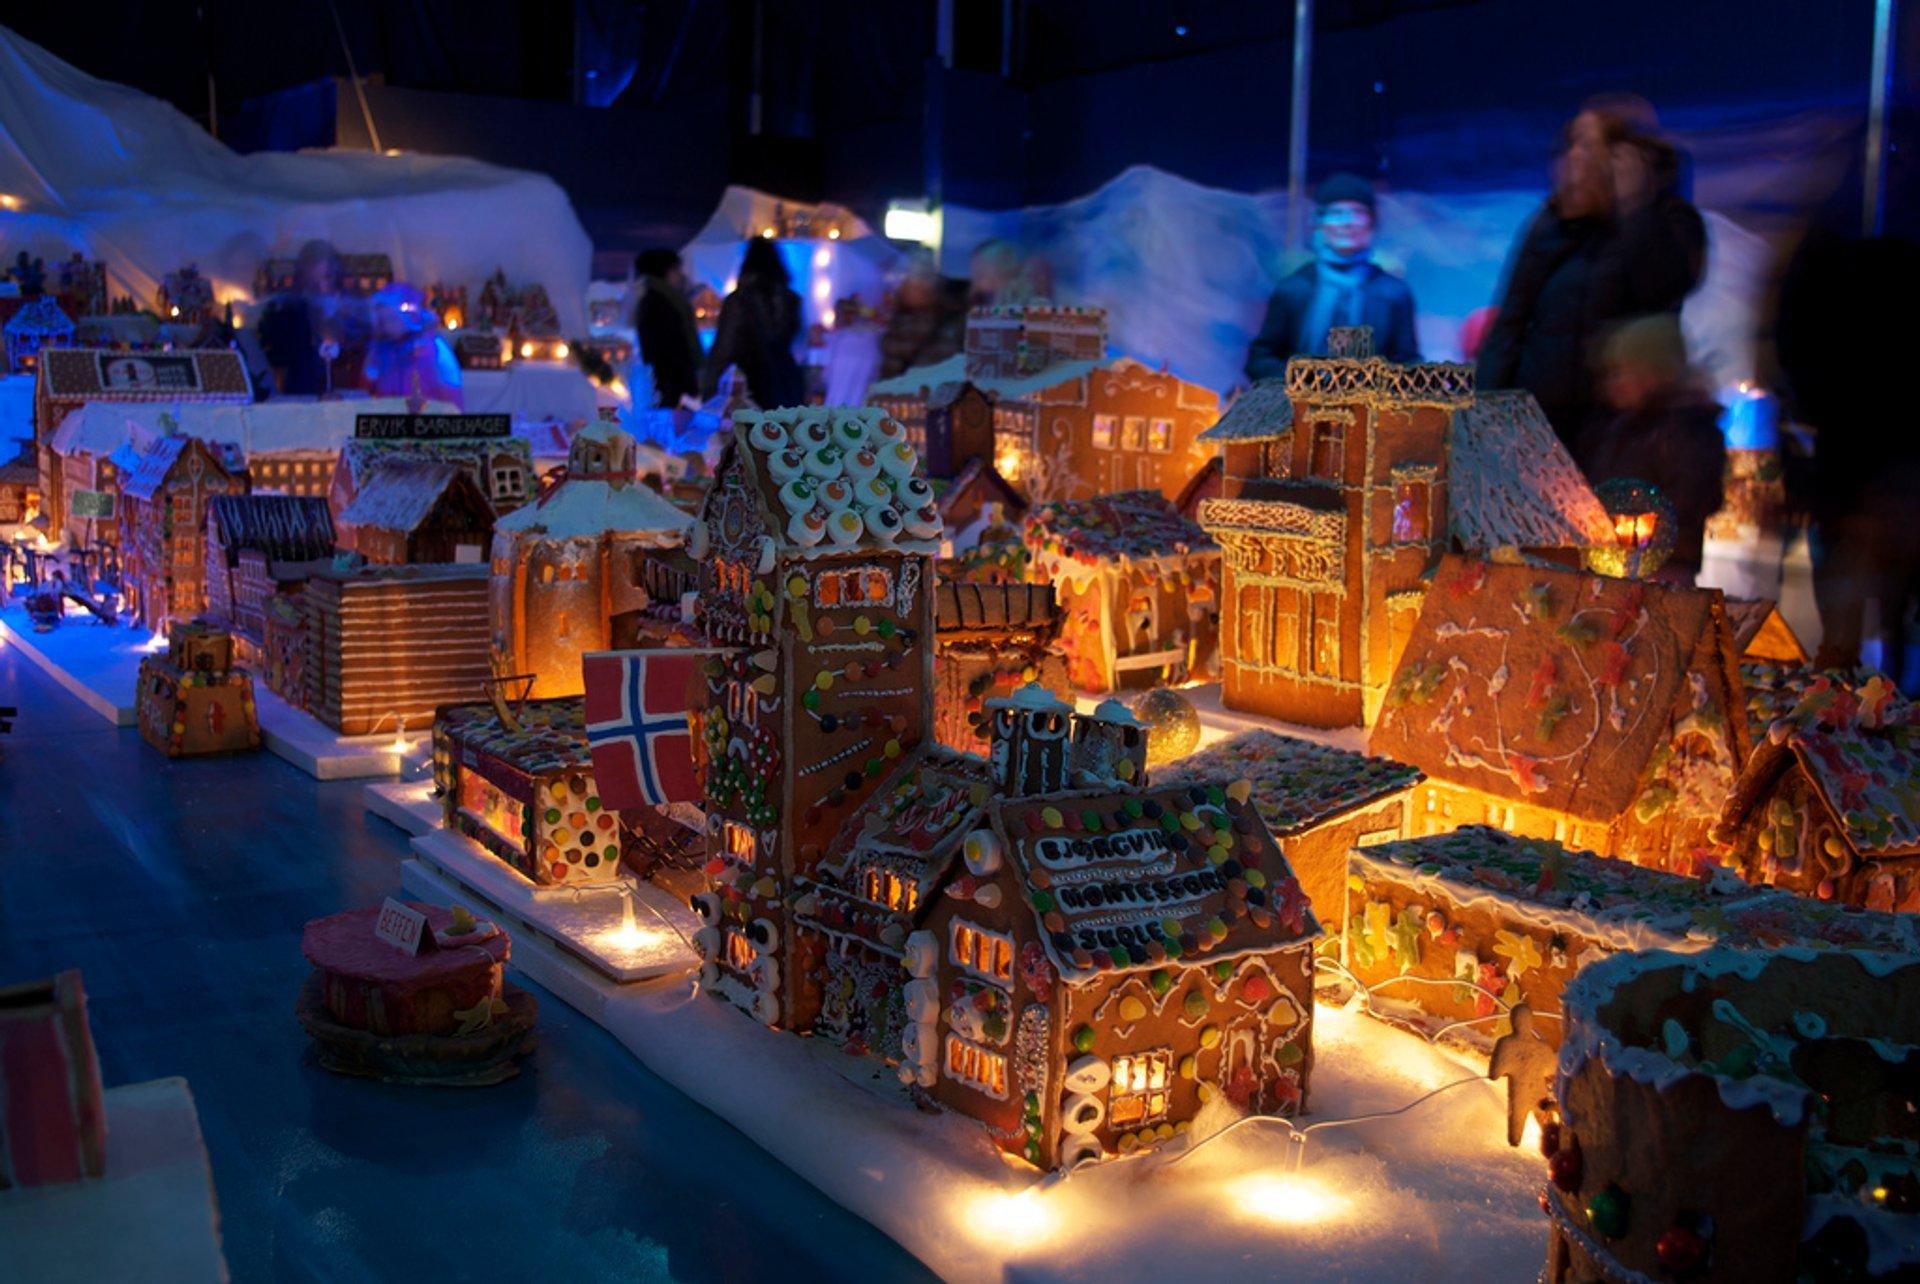 Bergen's Gingerbread Town (Pepperkakebyen) in Norway 2020 - Best Time